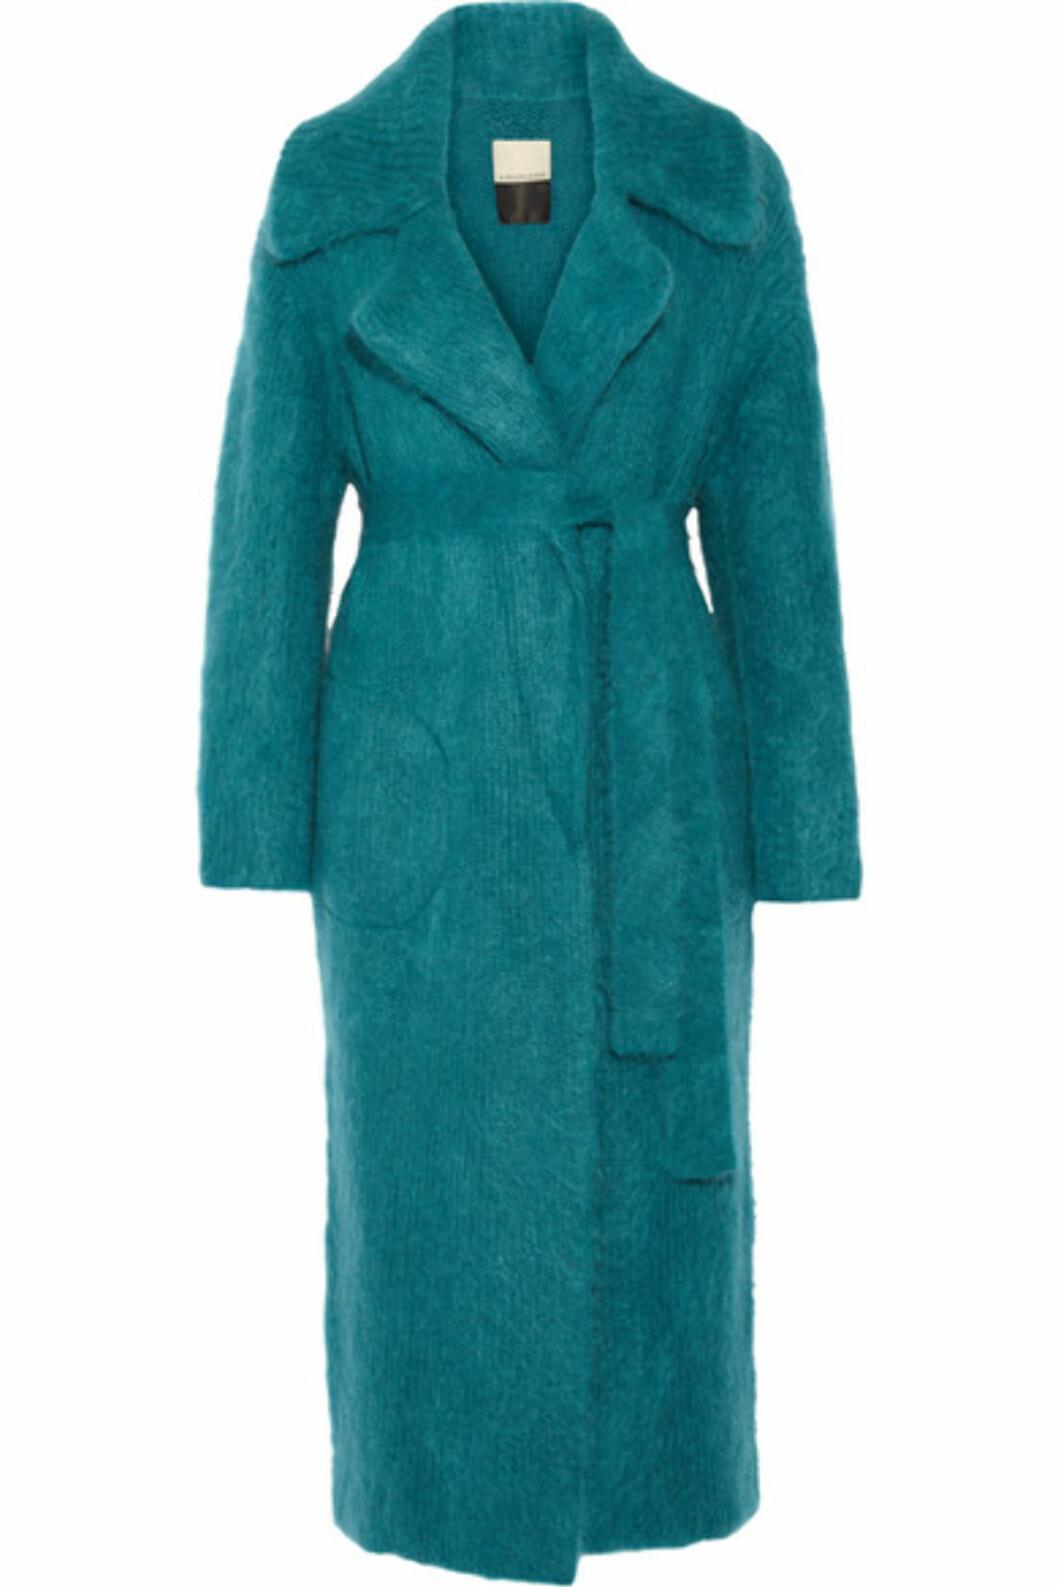 Kåpe fra By Malene Birger via Net-a-porter.com | kr 6378 | https://www.net-a-porter.com/no/en/product/751301/by_malene_birger/jovillan-ribbed-knit-coat